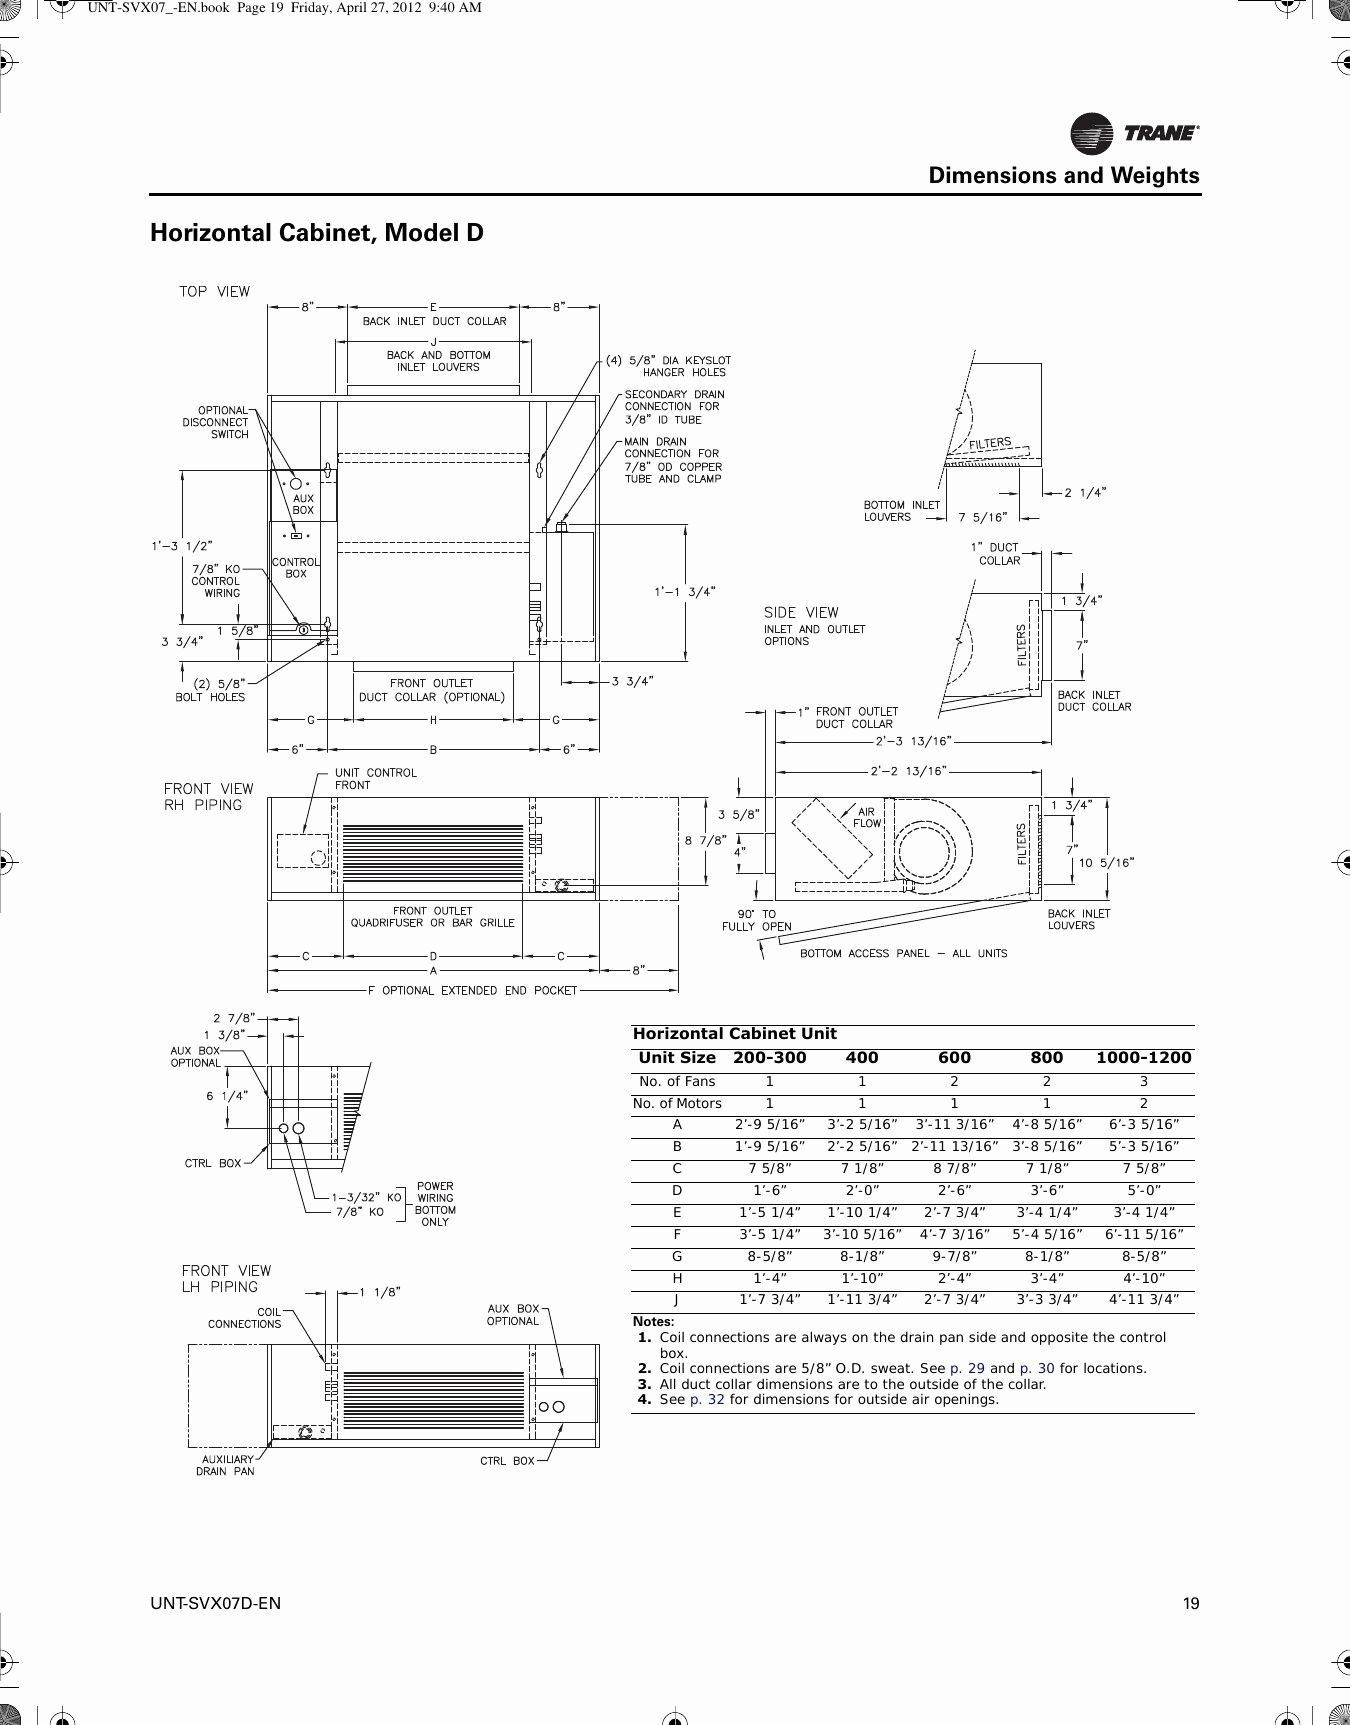 unique wiring diagram for underfloor heating thermostat #diagrams  #digramssample #diagramimages #wiringdiagramsample #wiringdiagram